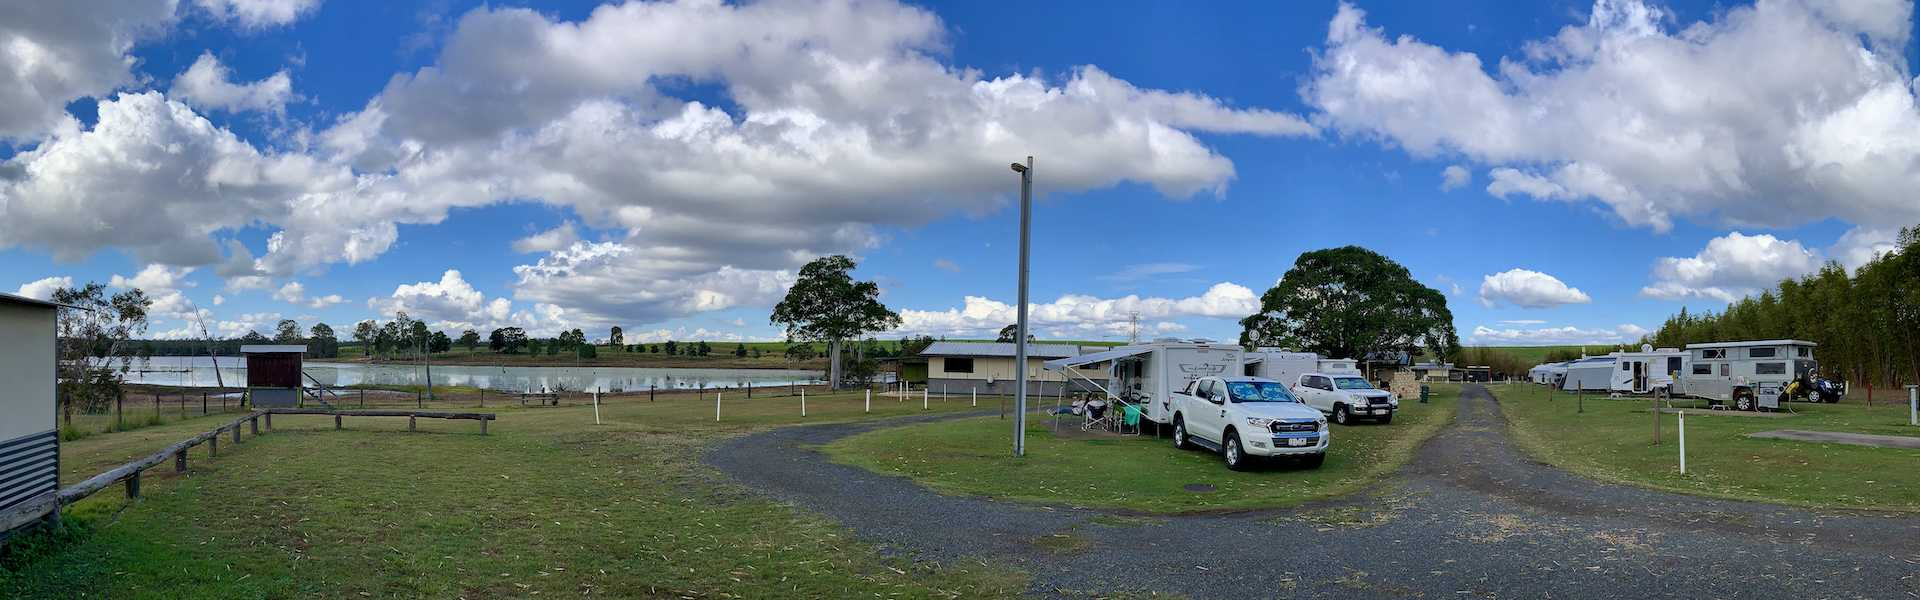 Kui Parks, Lake Redbrook Holiday Retreat, Childers QLD